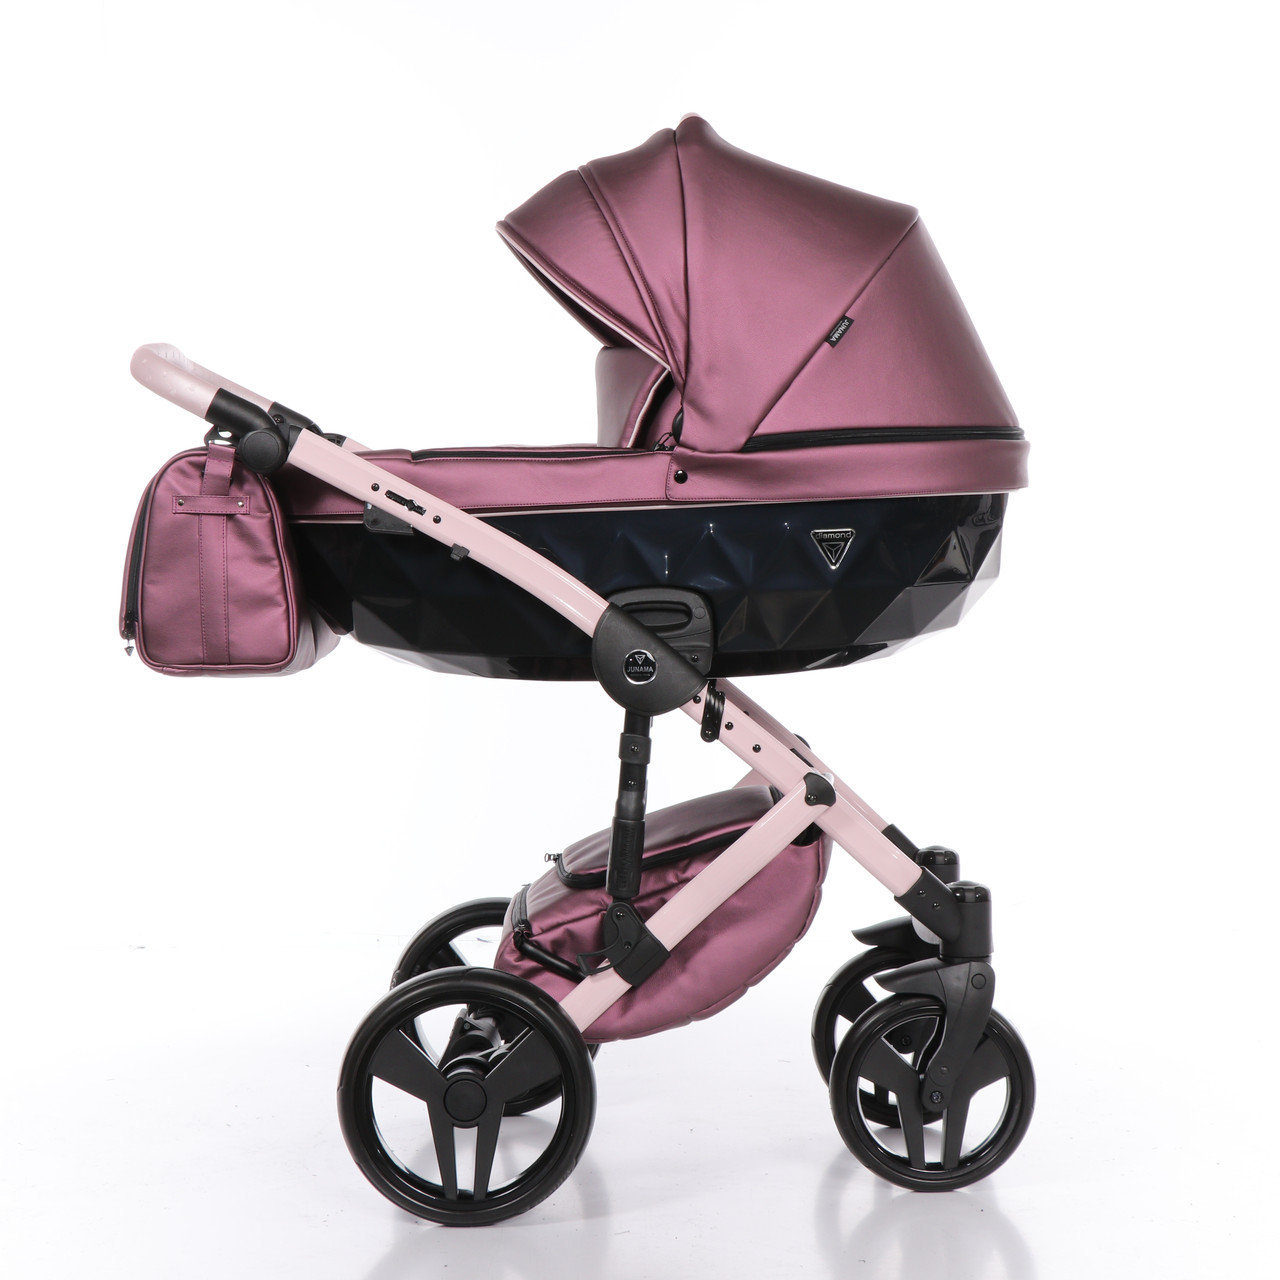 Дитяча коляска 2 в 1 Junama Diamond Fluo line II рожева 08